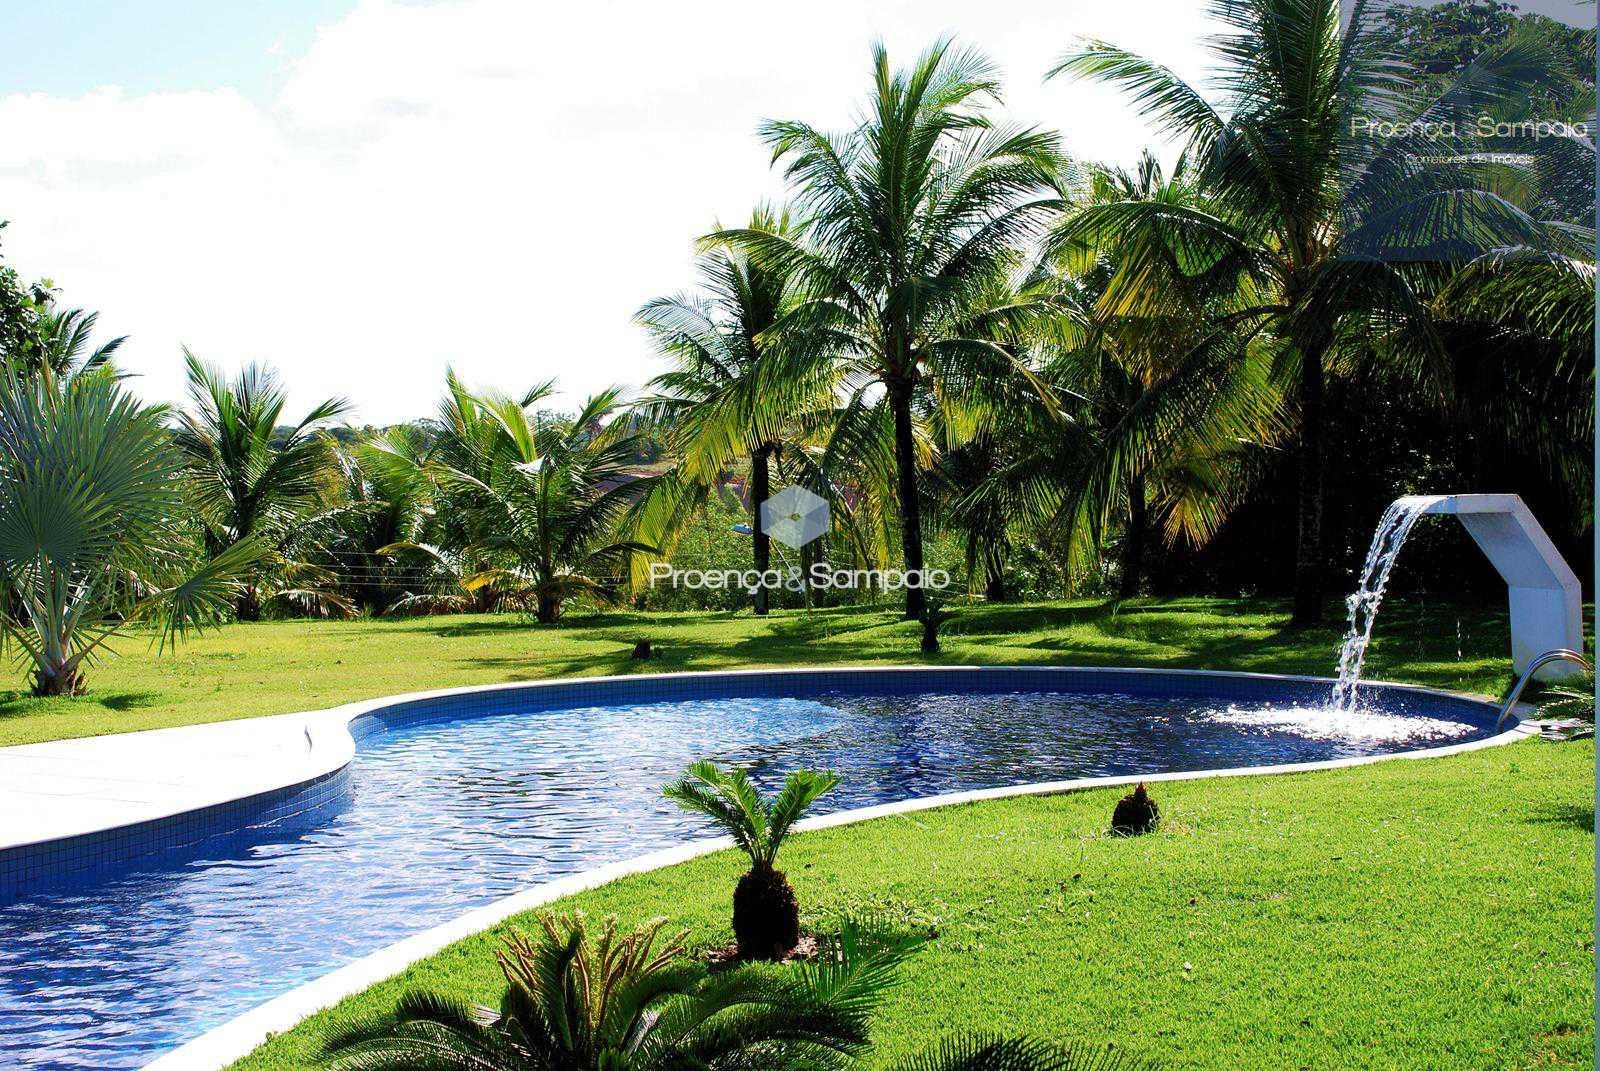 FOTO8 - Casa em Condomínio à venda Avenida Santos Dumont,Lauro de Freitas,BA - R$ 7.000.000 - PSCN50005 - 10